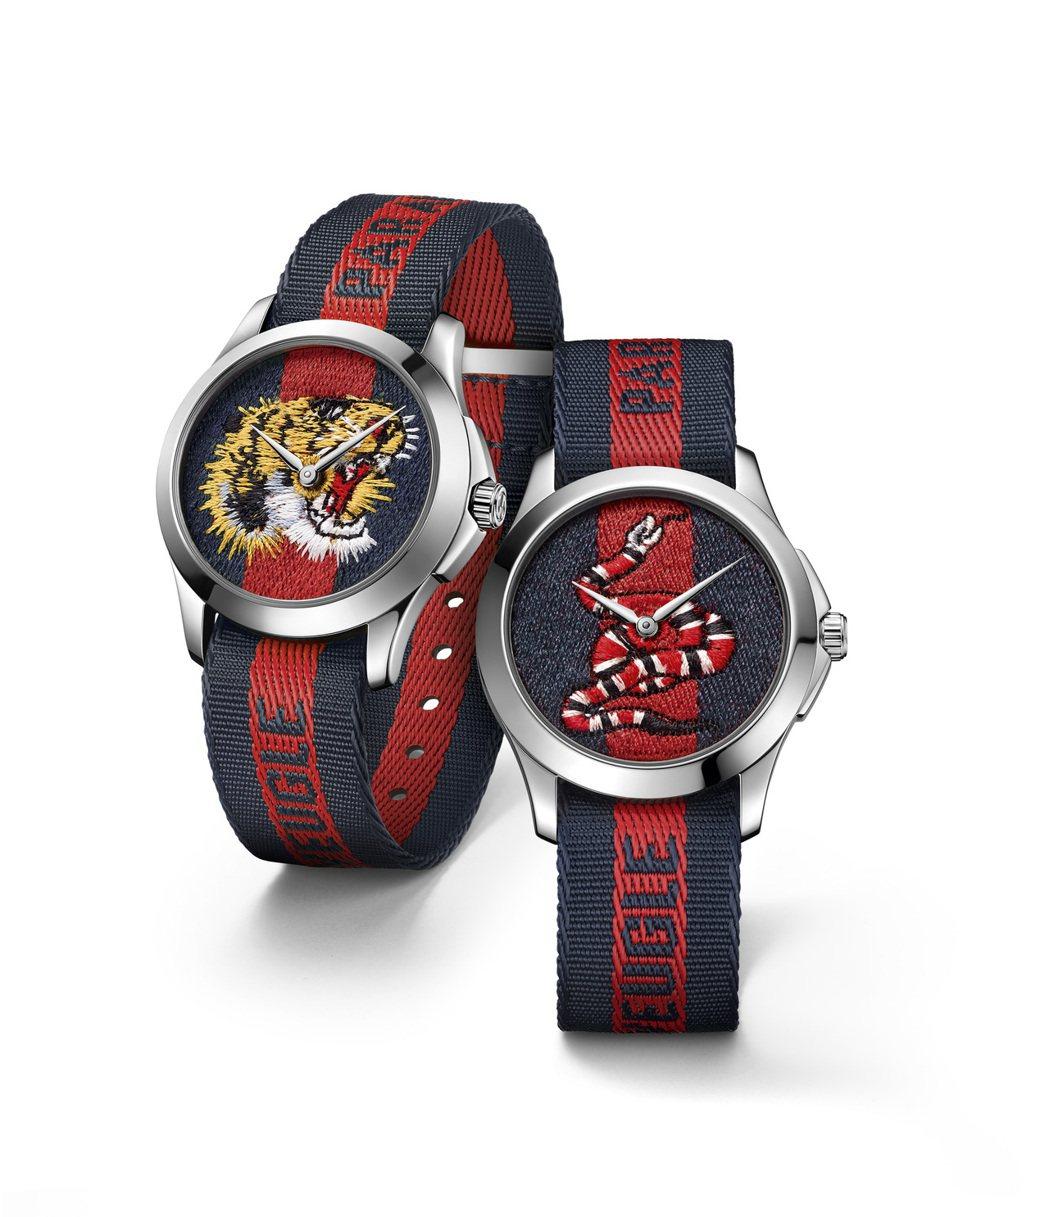 GUCCI奇蹟市集系列腕表,38毫米帆布織帶表盤飾有虎頭、珊瑚蛇刺繡,不鏽鋼表殼...